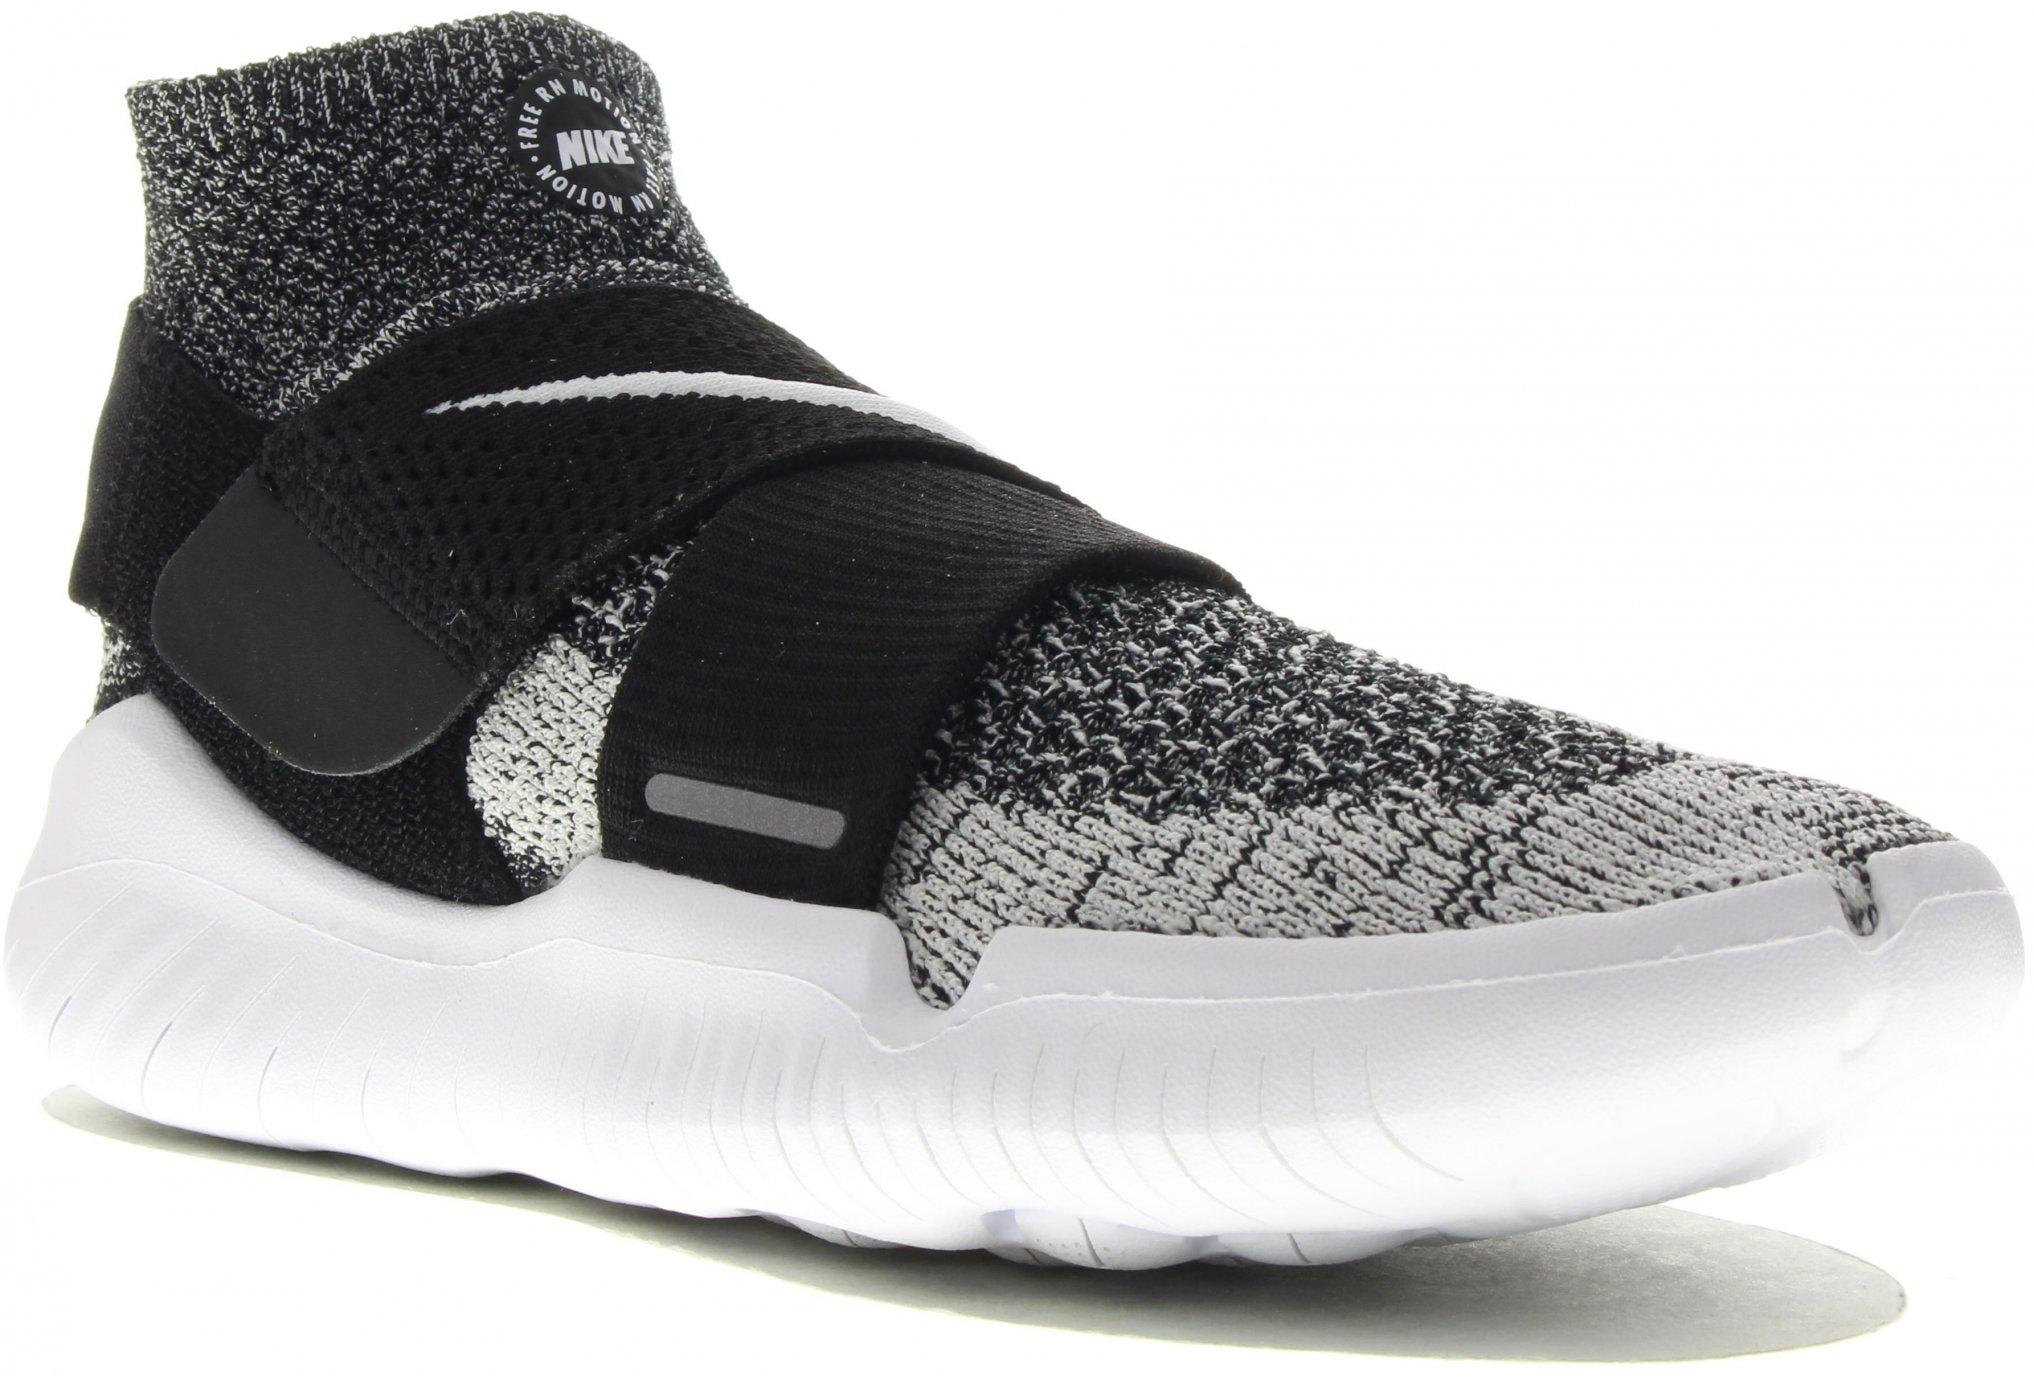 Nike Free RN Motion Flyknit W Diététique Chaussures femme